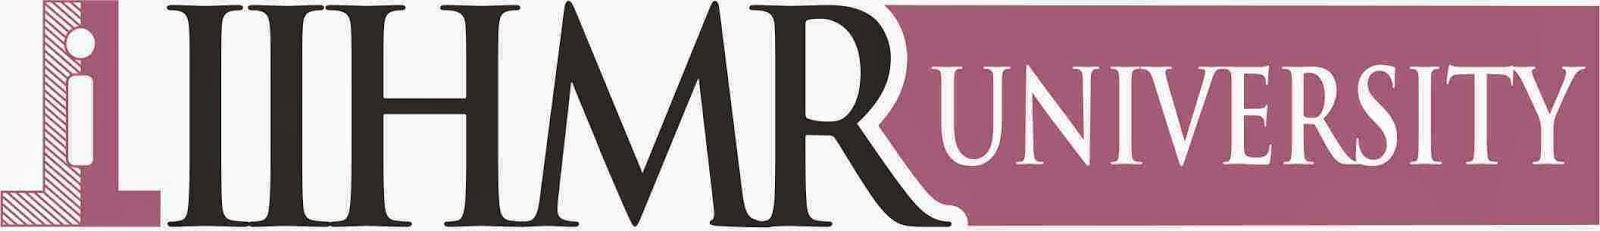 logo_IIHMR-University.jpg